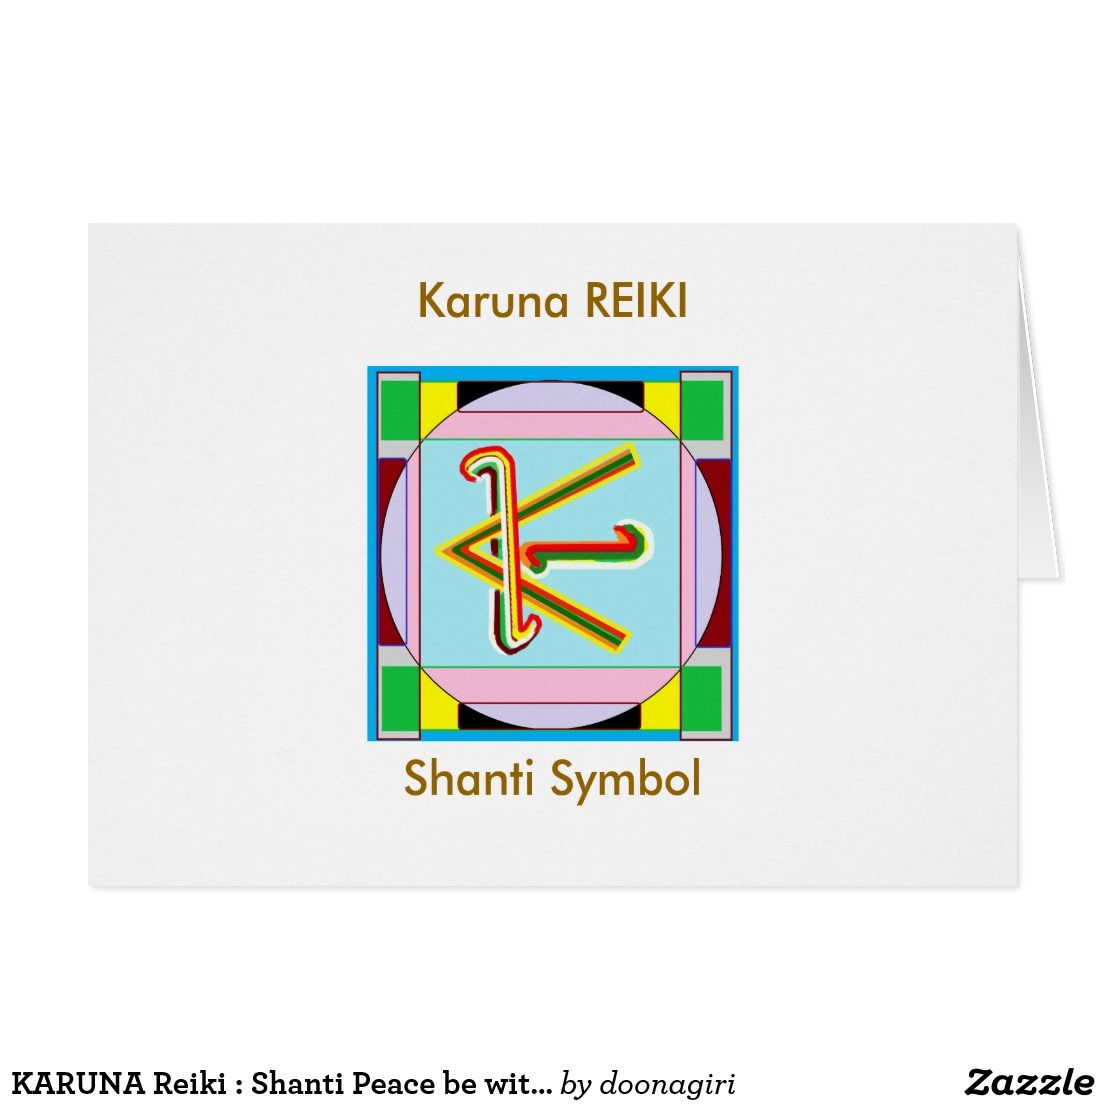 Reiki shanti peace be with all card karuna reiki shanti peace be with all card buycottarizona